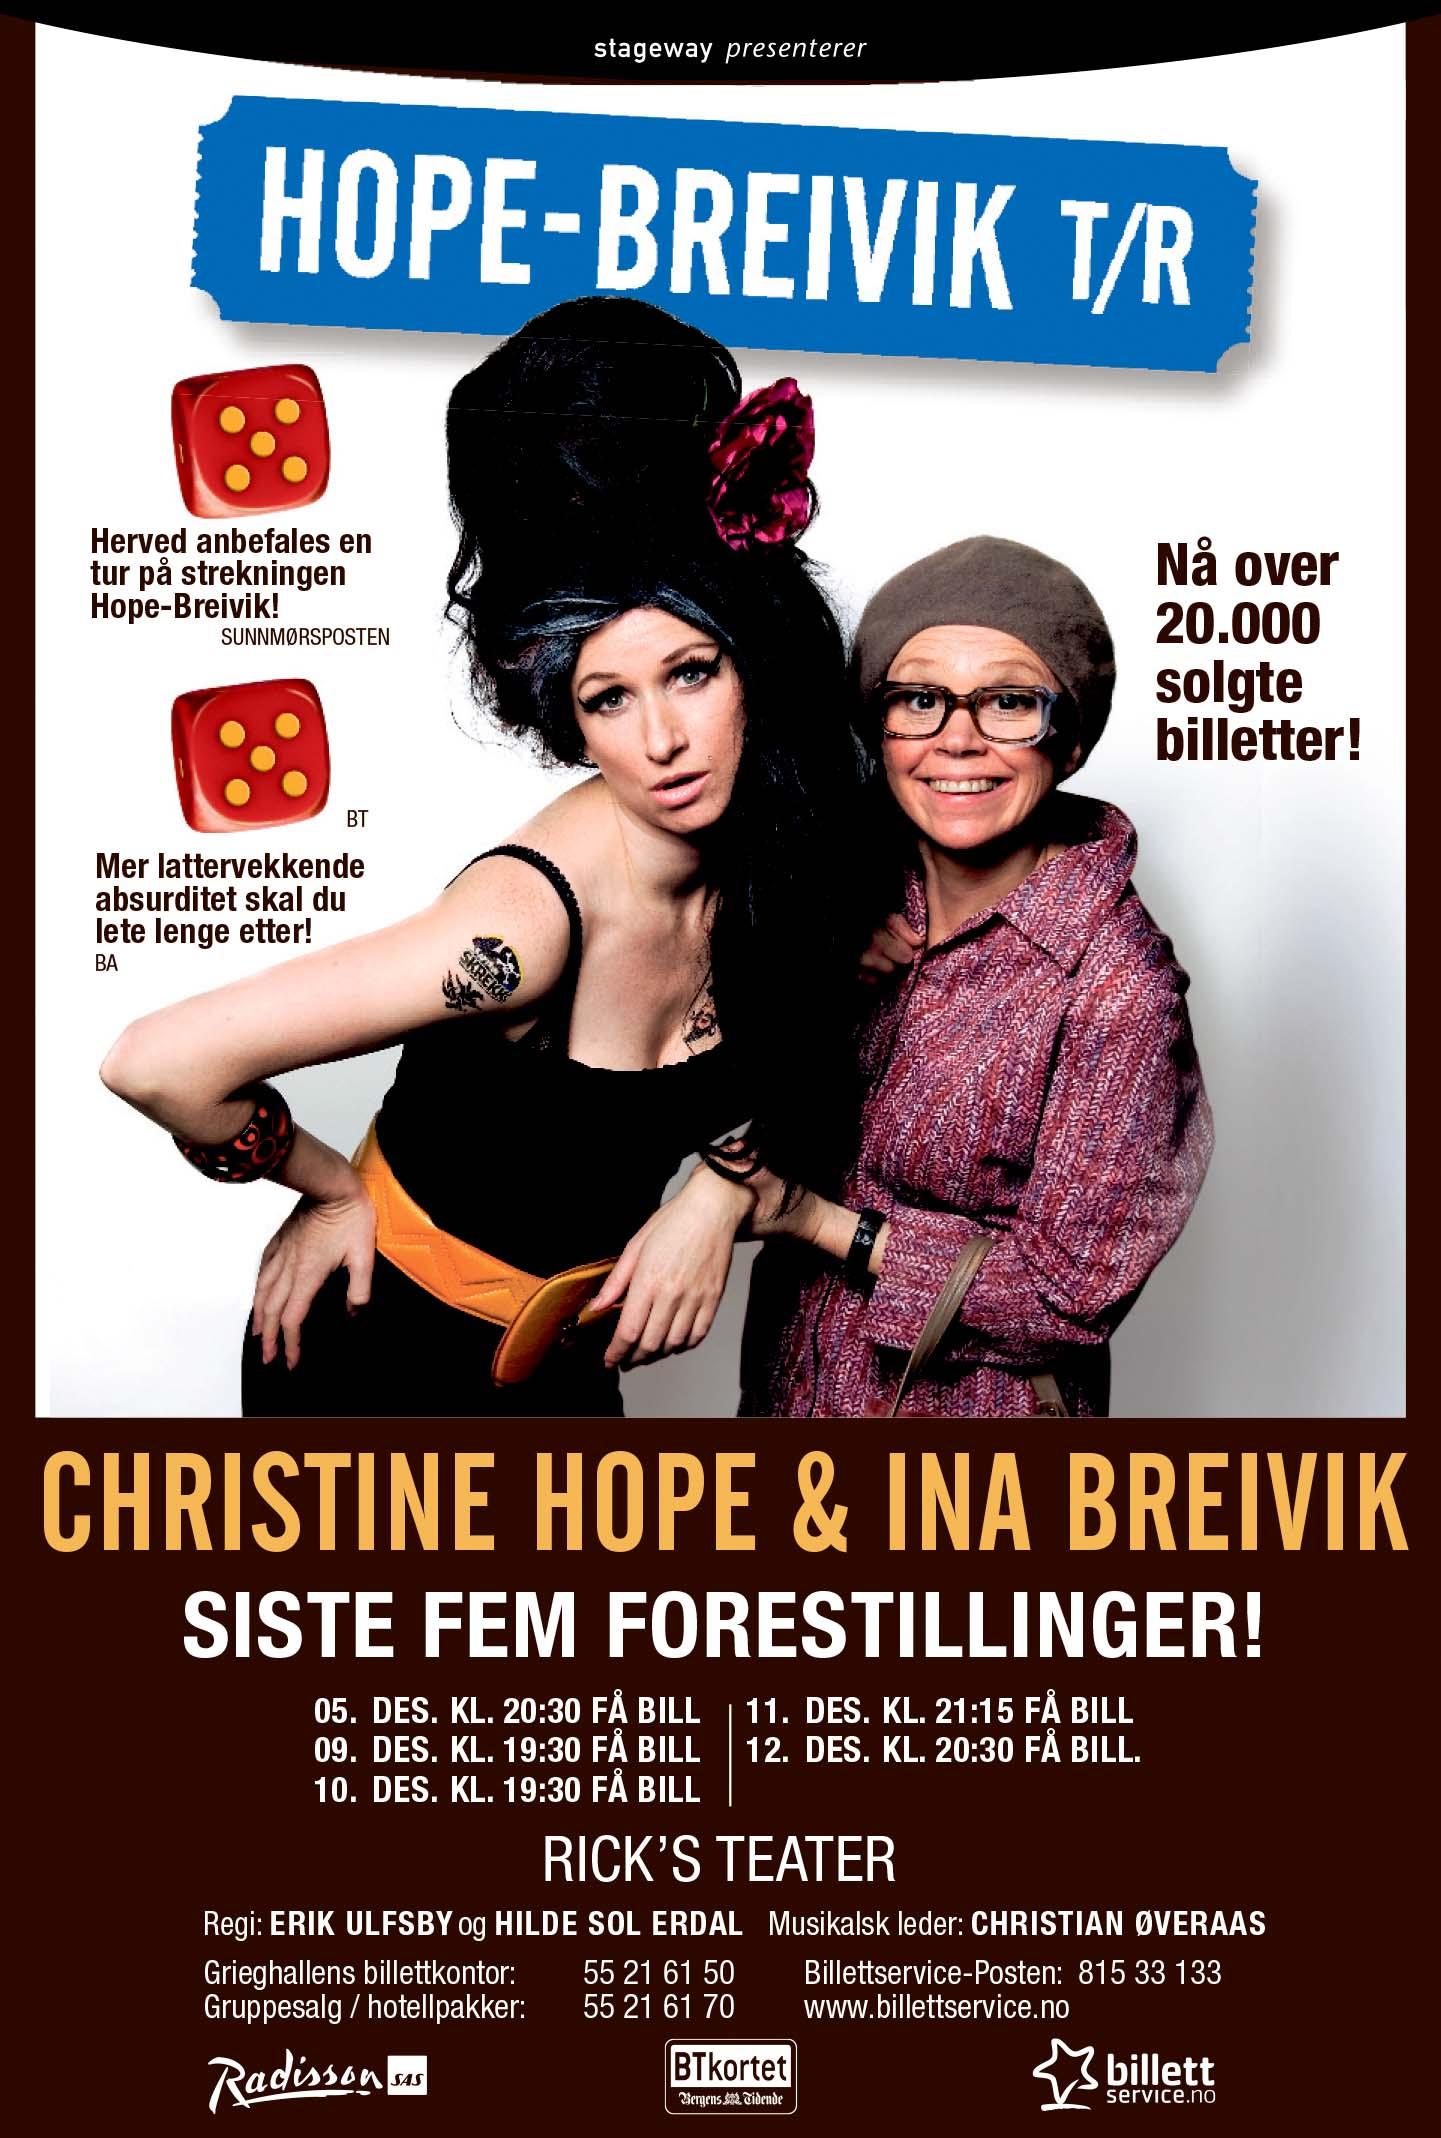 Hope - Breivik T/R